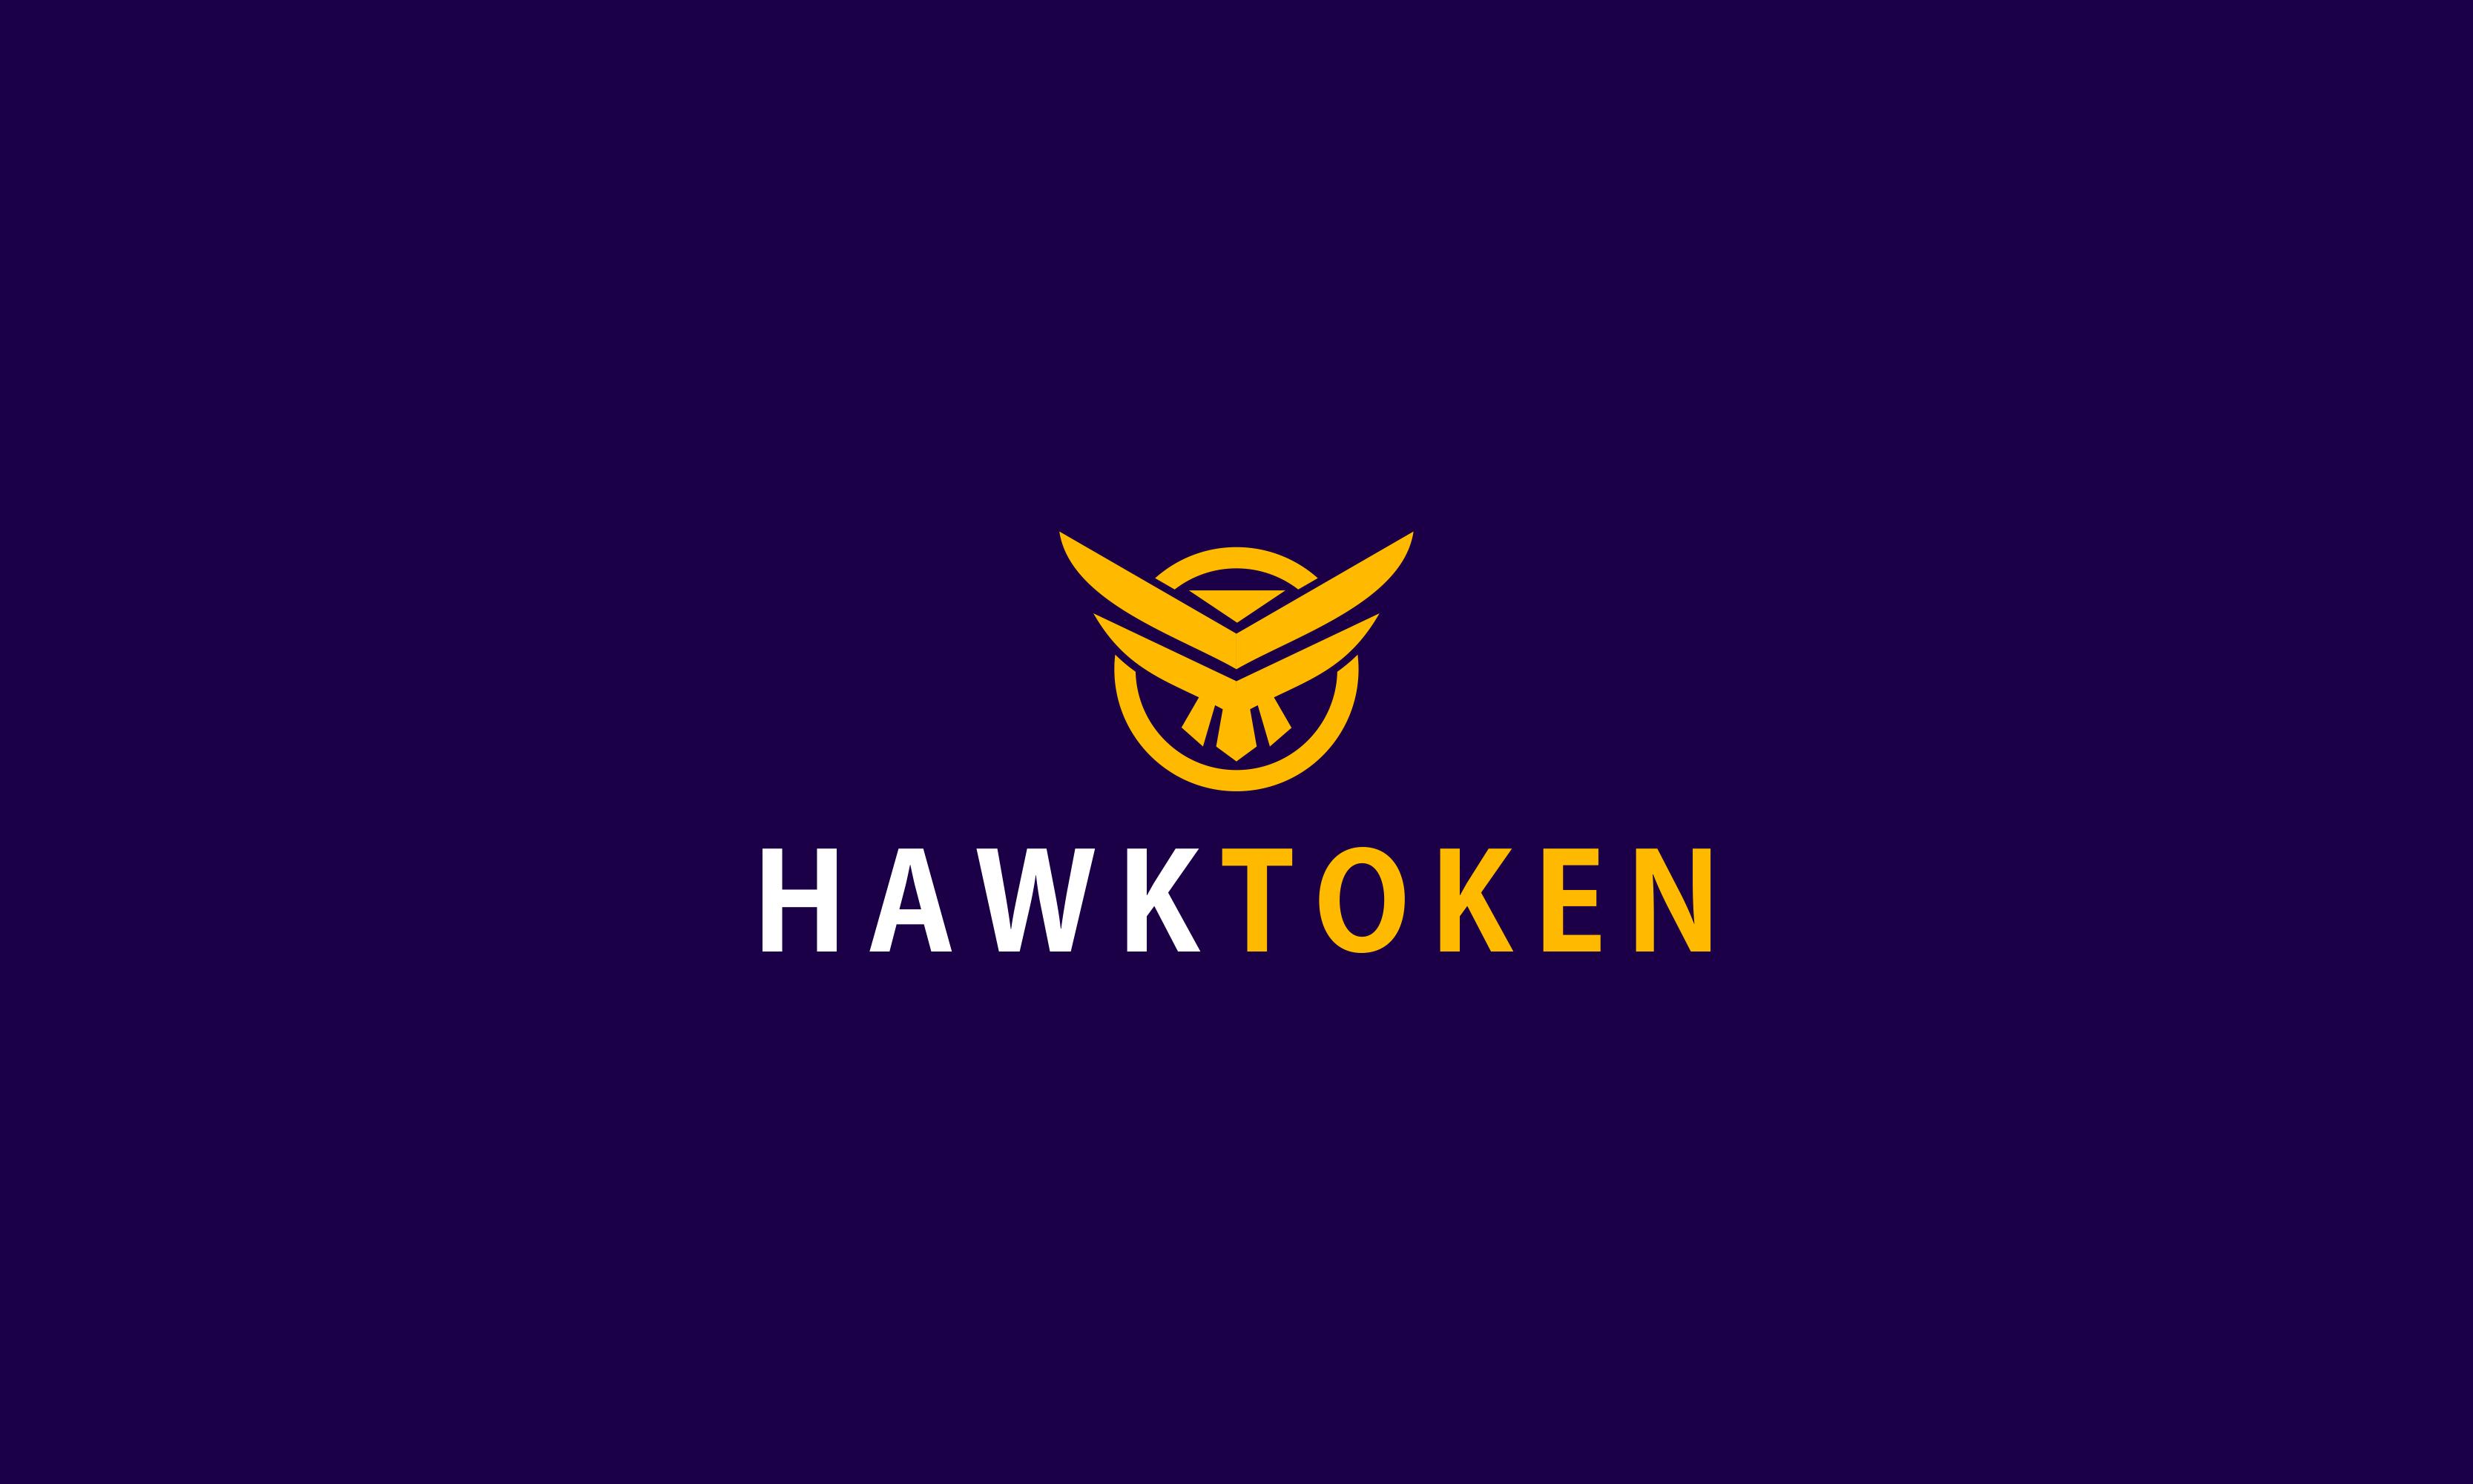 hawktoken